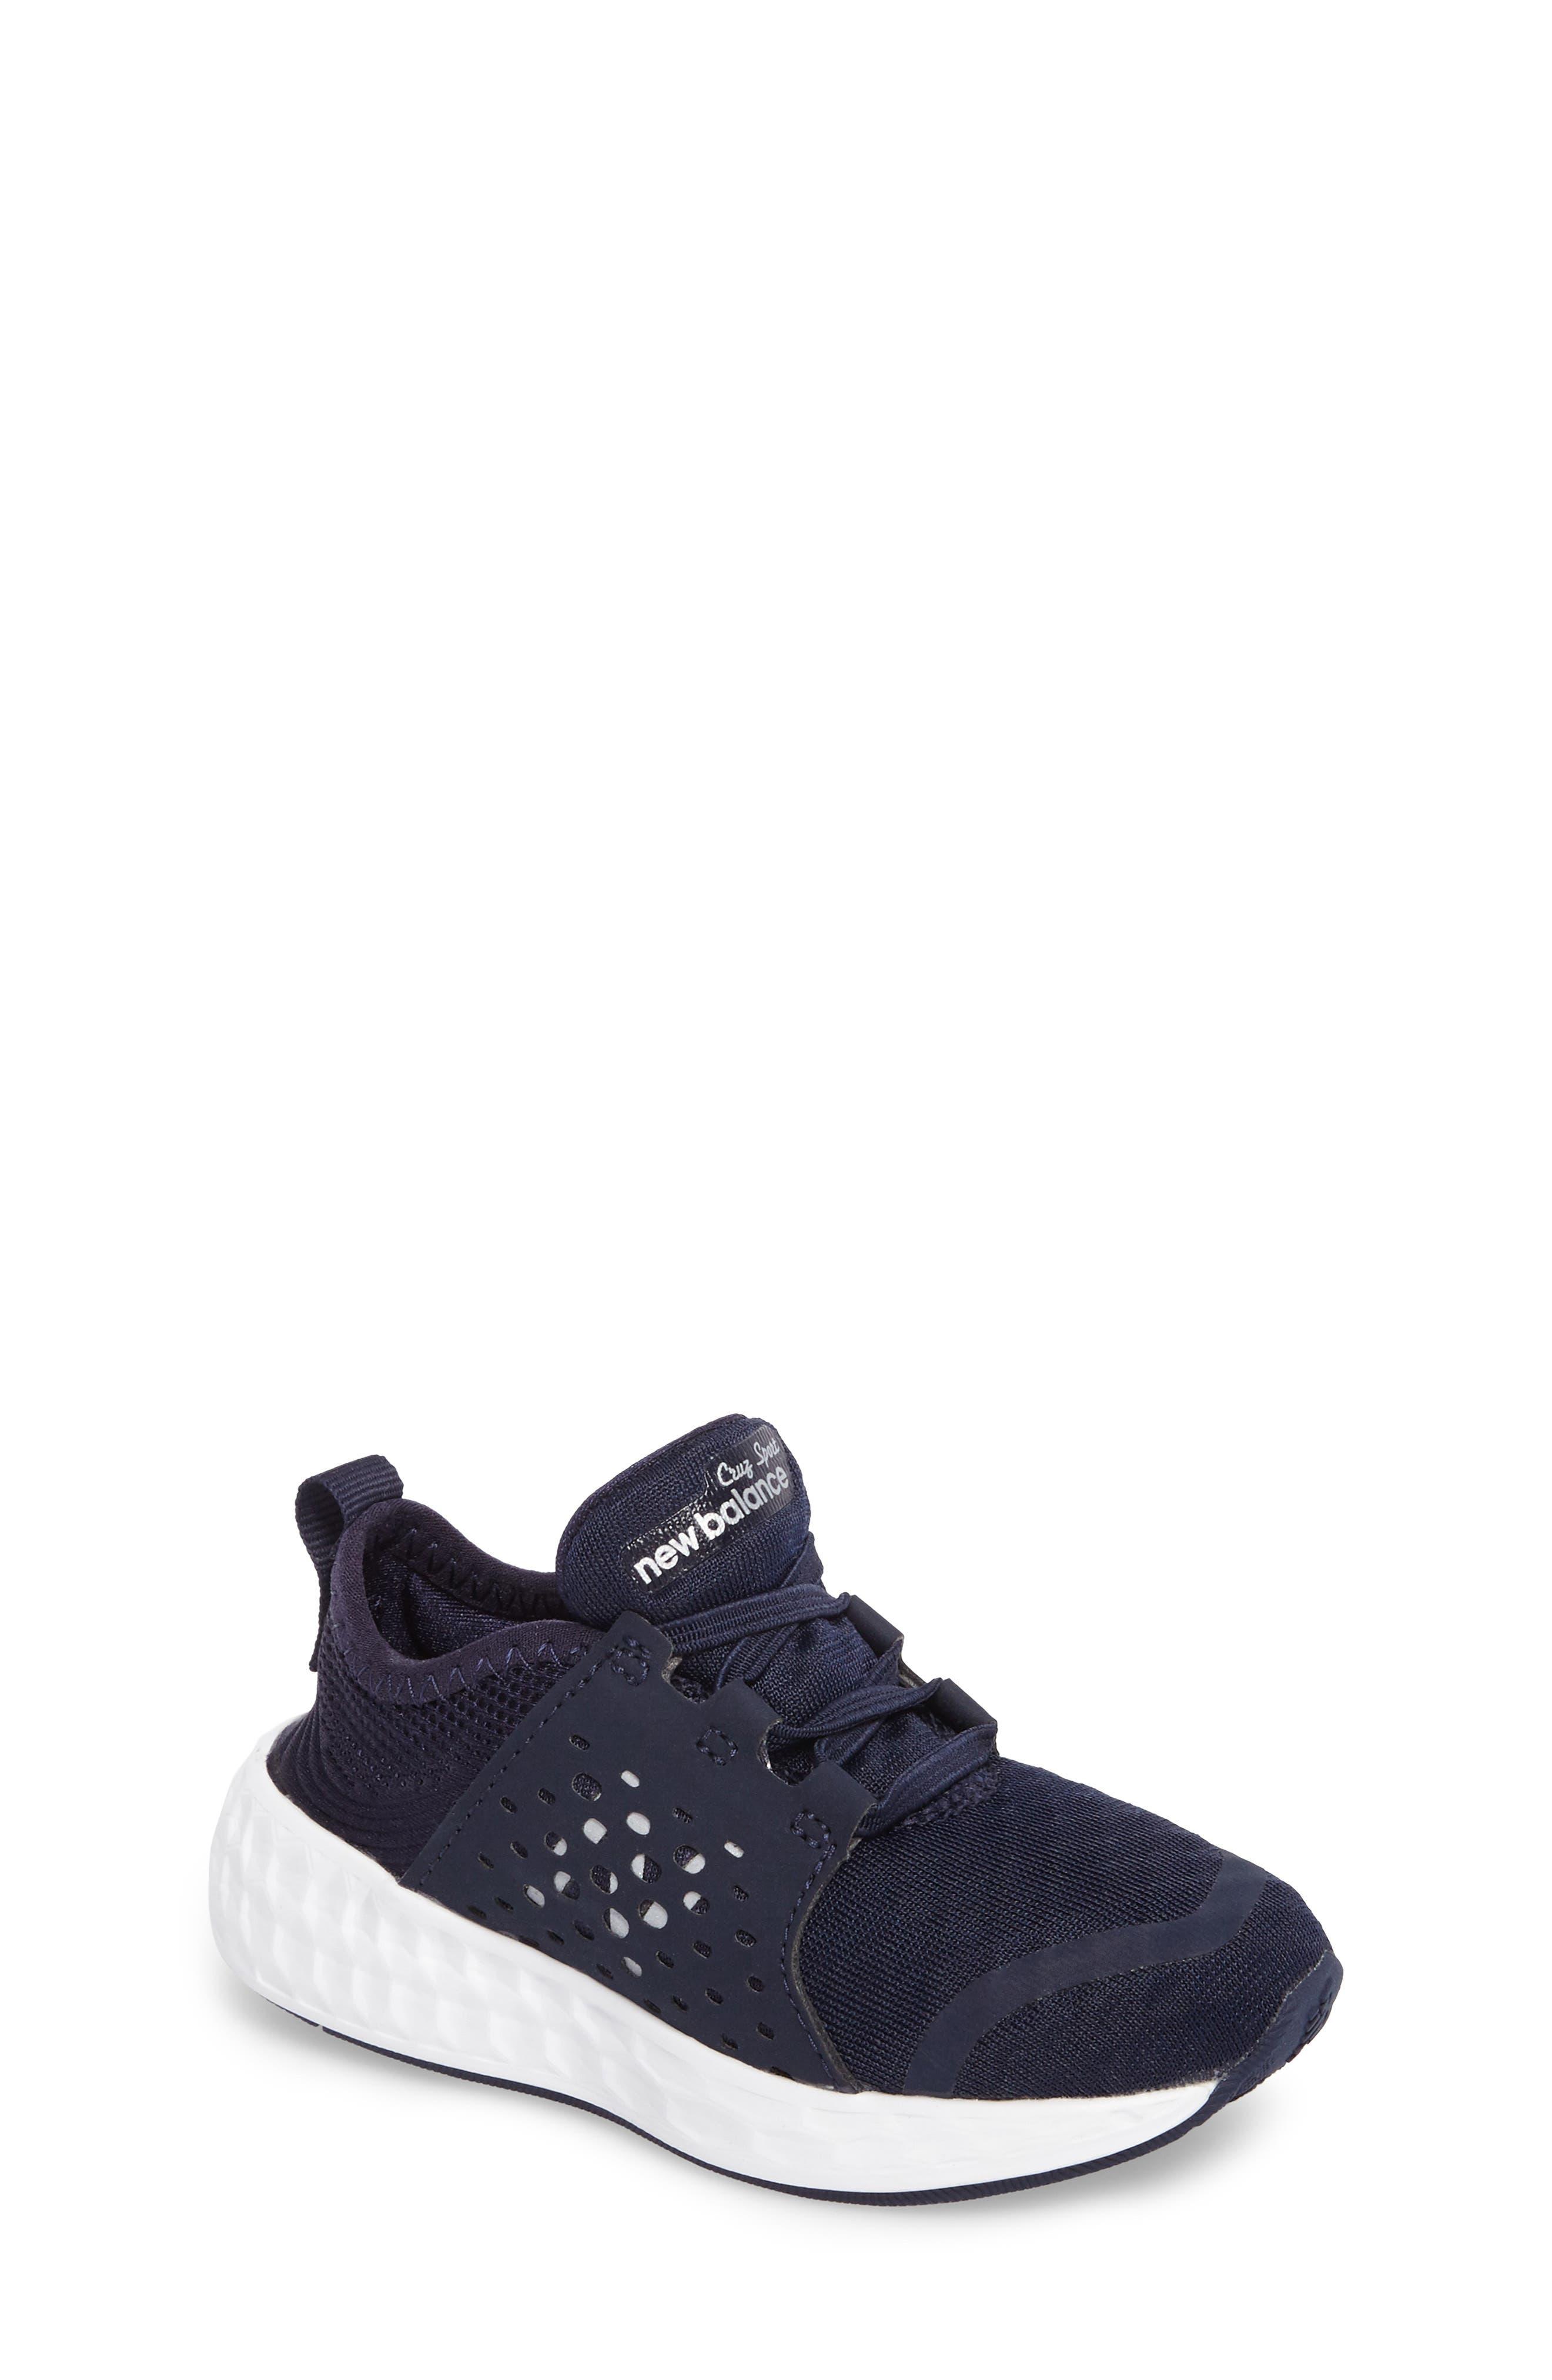 Cruz Sport Sneaker,                         Main,                         color, Navy/ White